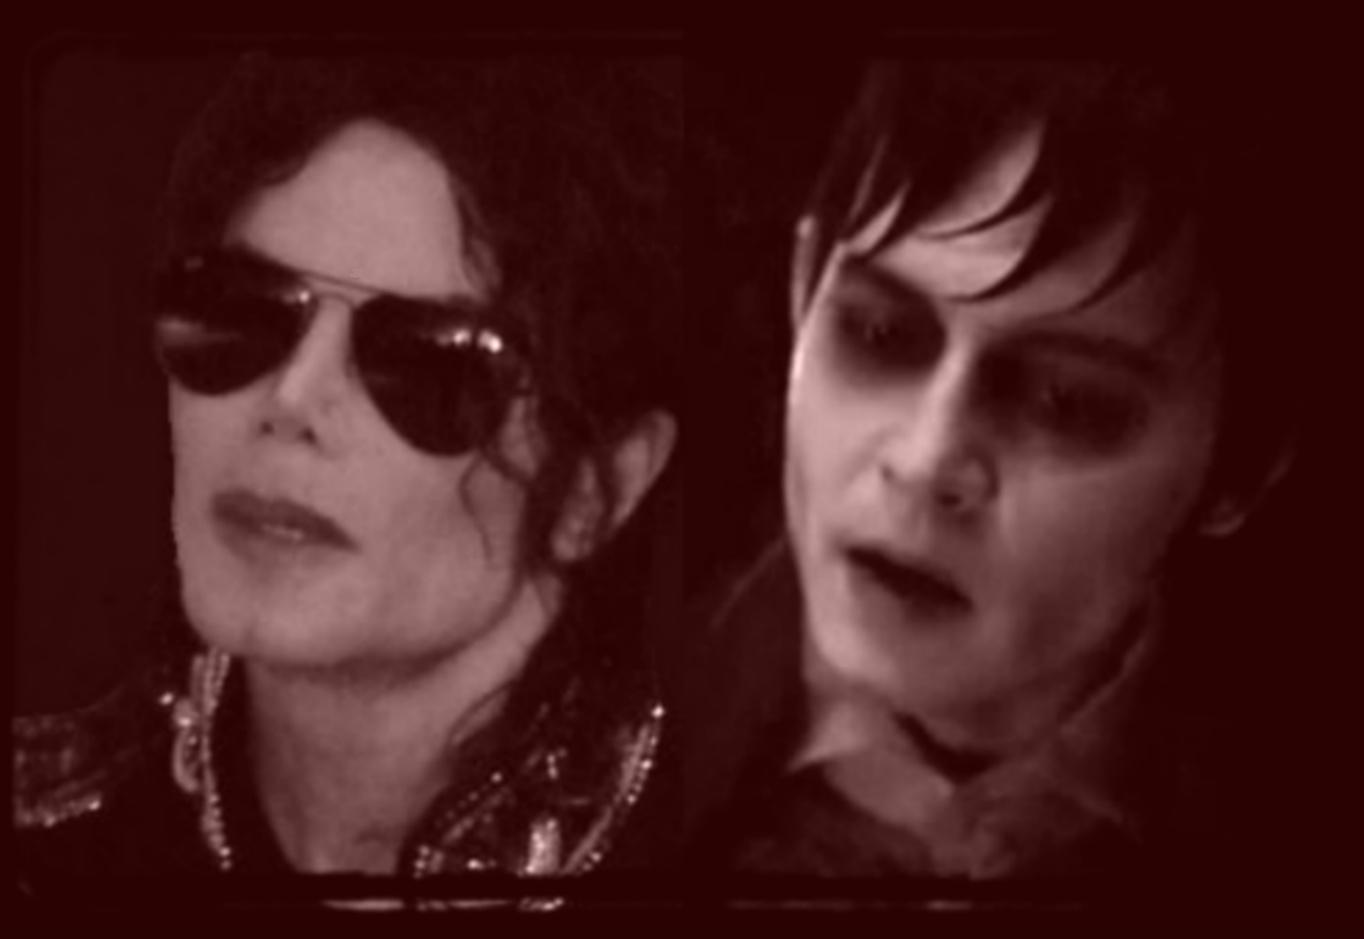 Michael Jackson and Johnny Depp – The amazing similarities